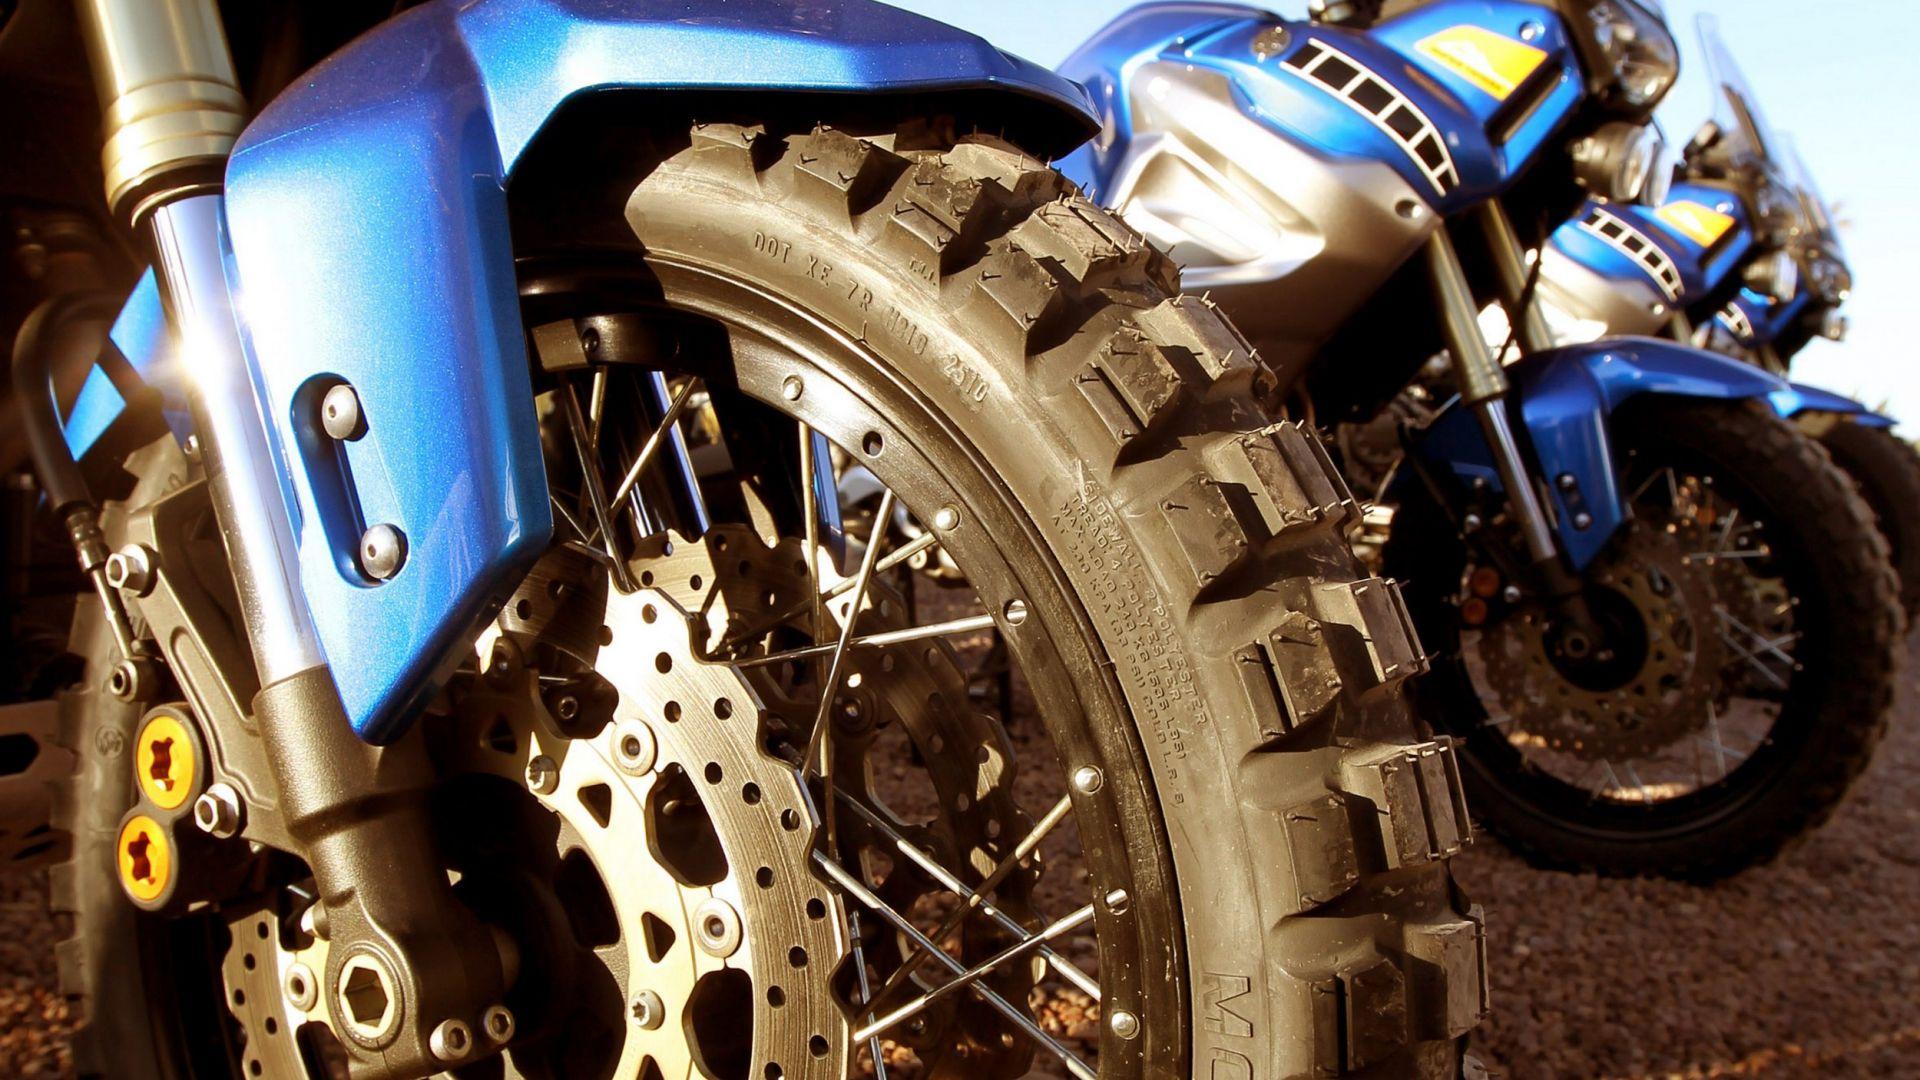 Immagine 34: In Marocco con la Yamaha Super Ténéré